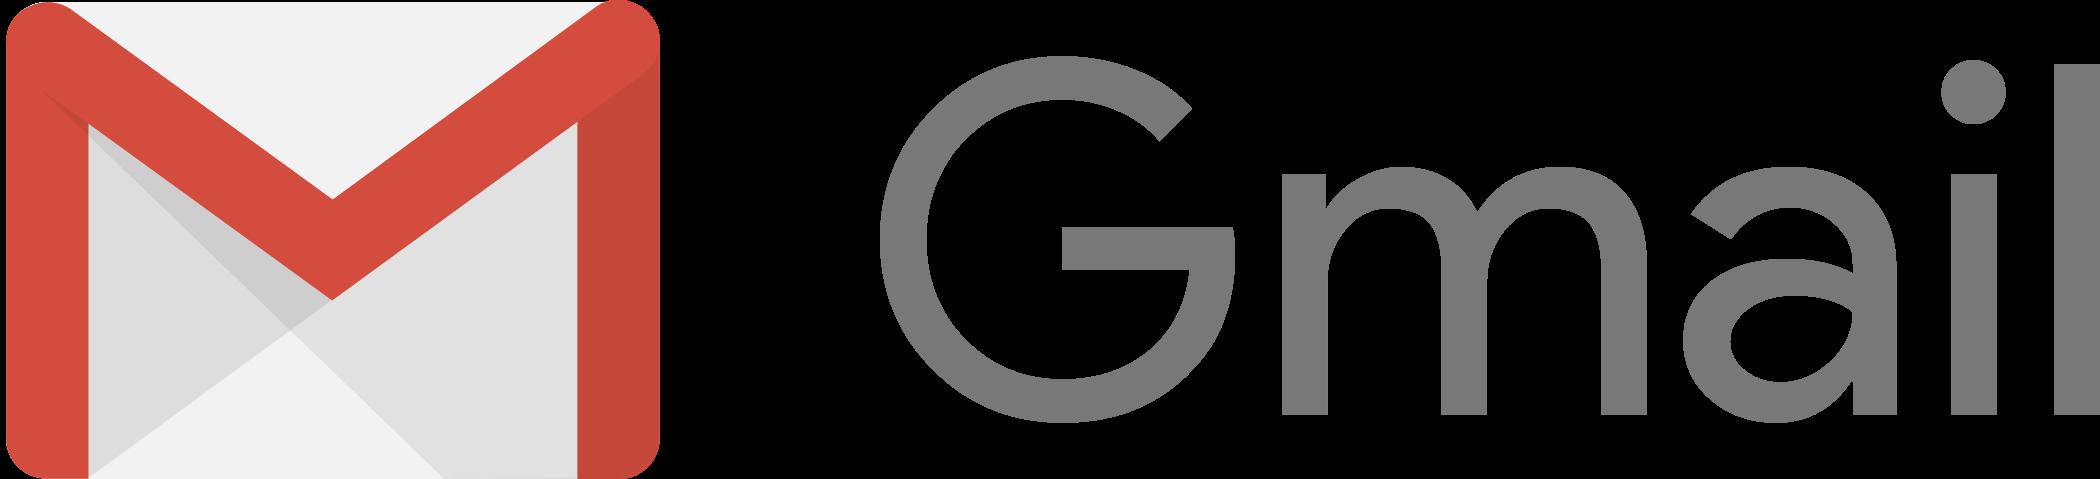 gmail-logo-2